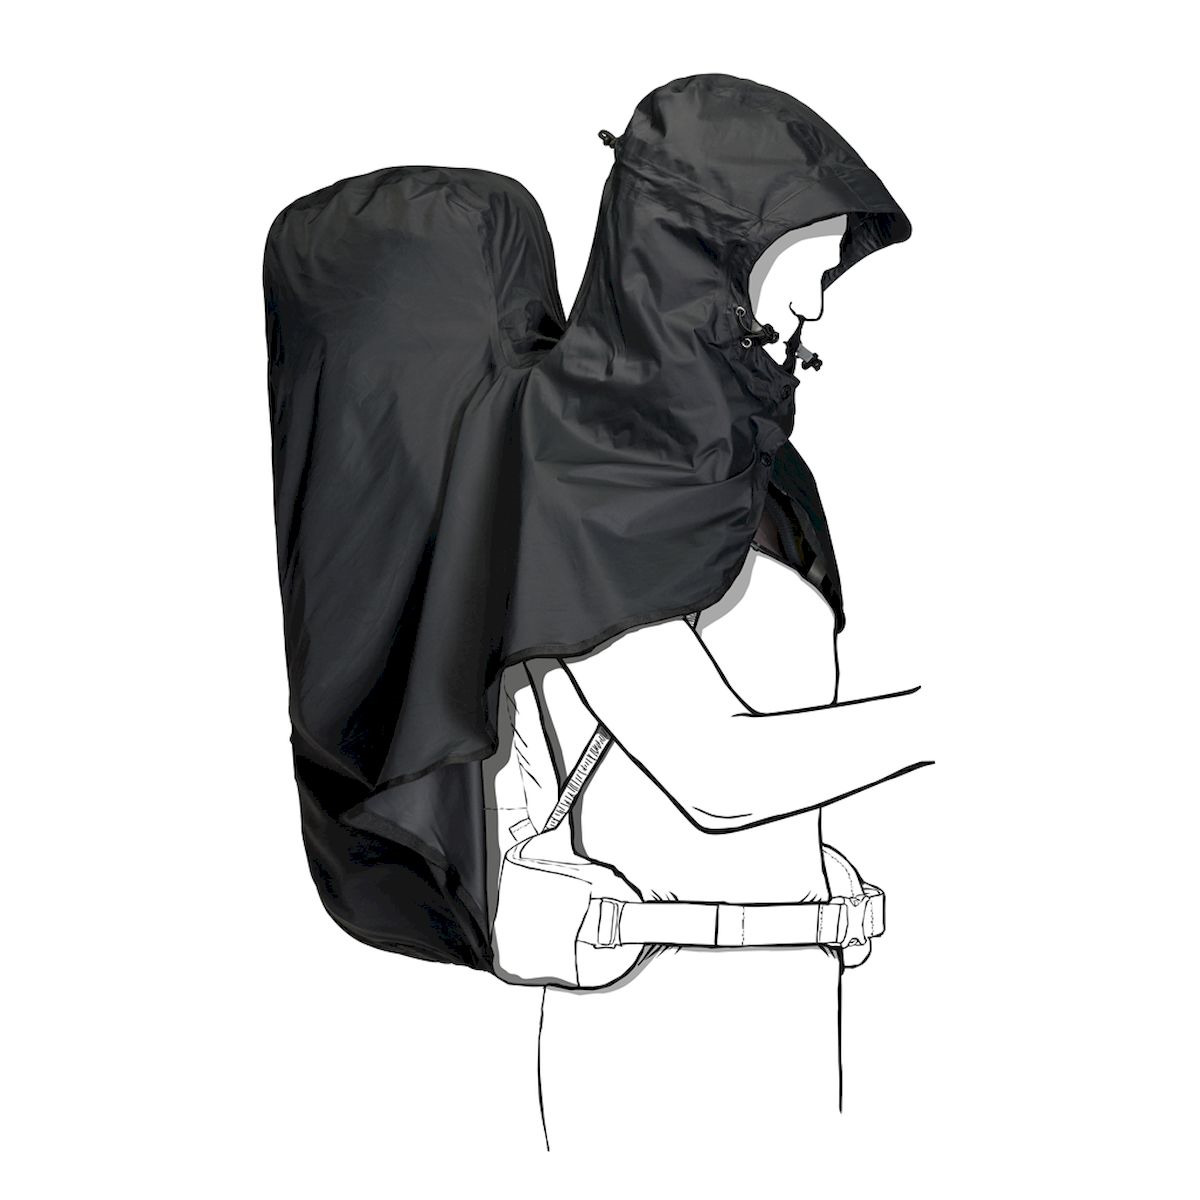 Чехол для рюкзаков Jack Wolfskin Raincover 14-20l, 8002741-6350, темно-серый